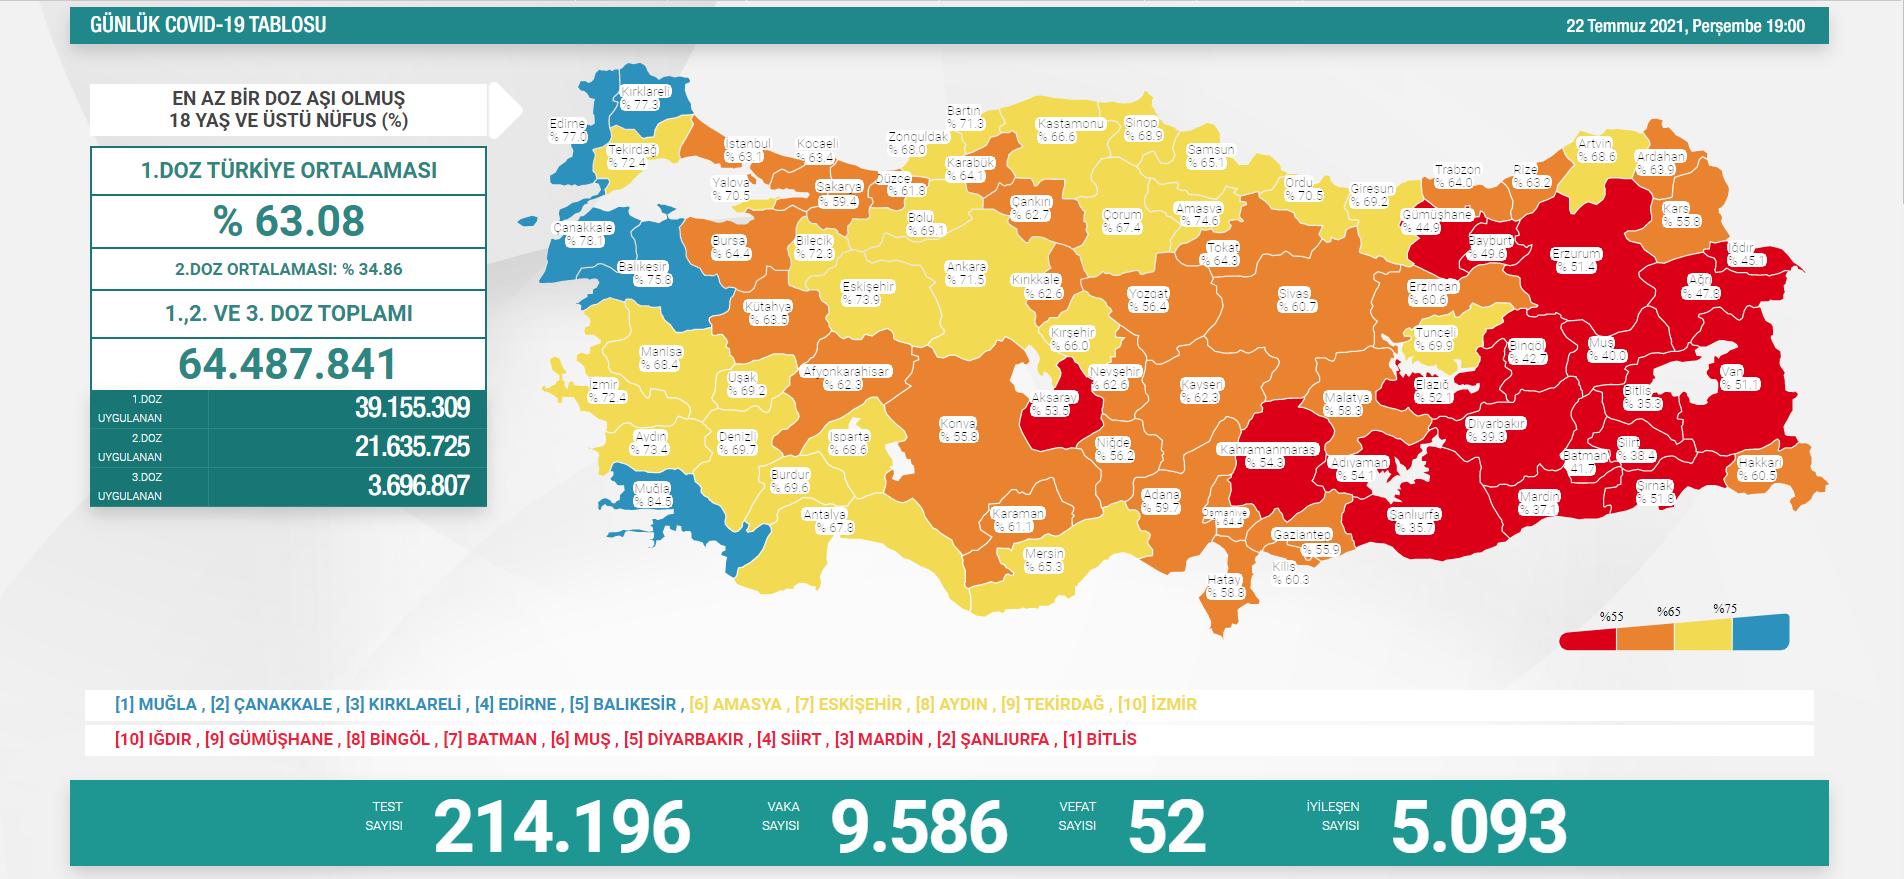 22-temmuz-turkiyede-koronavirus-tablosu.png